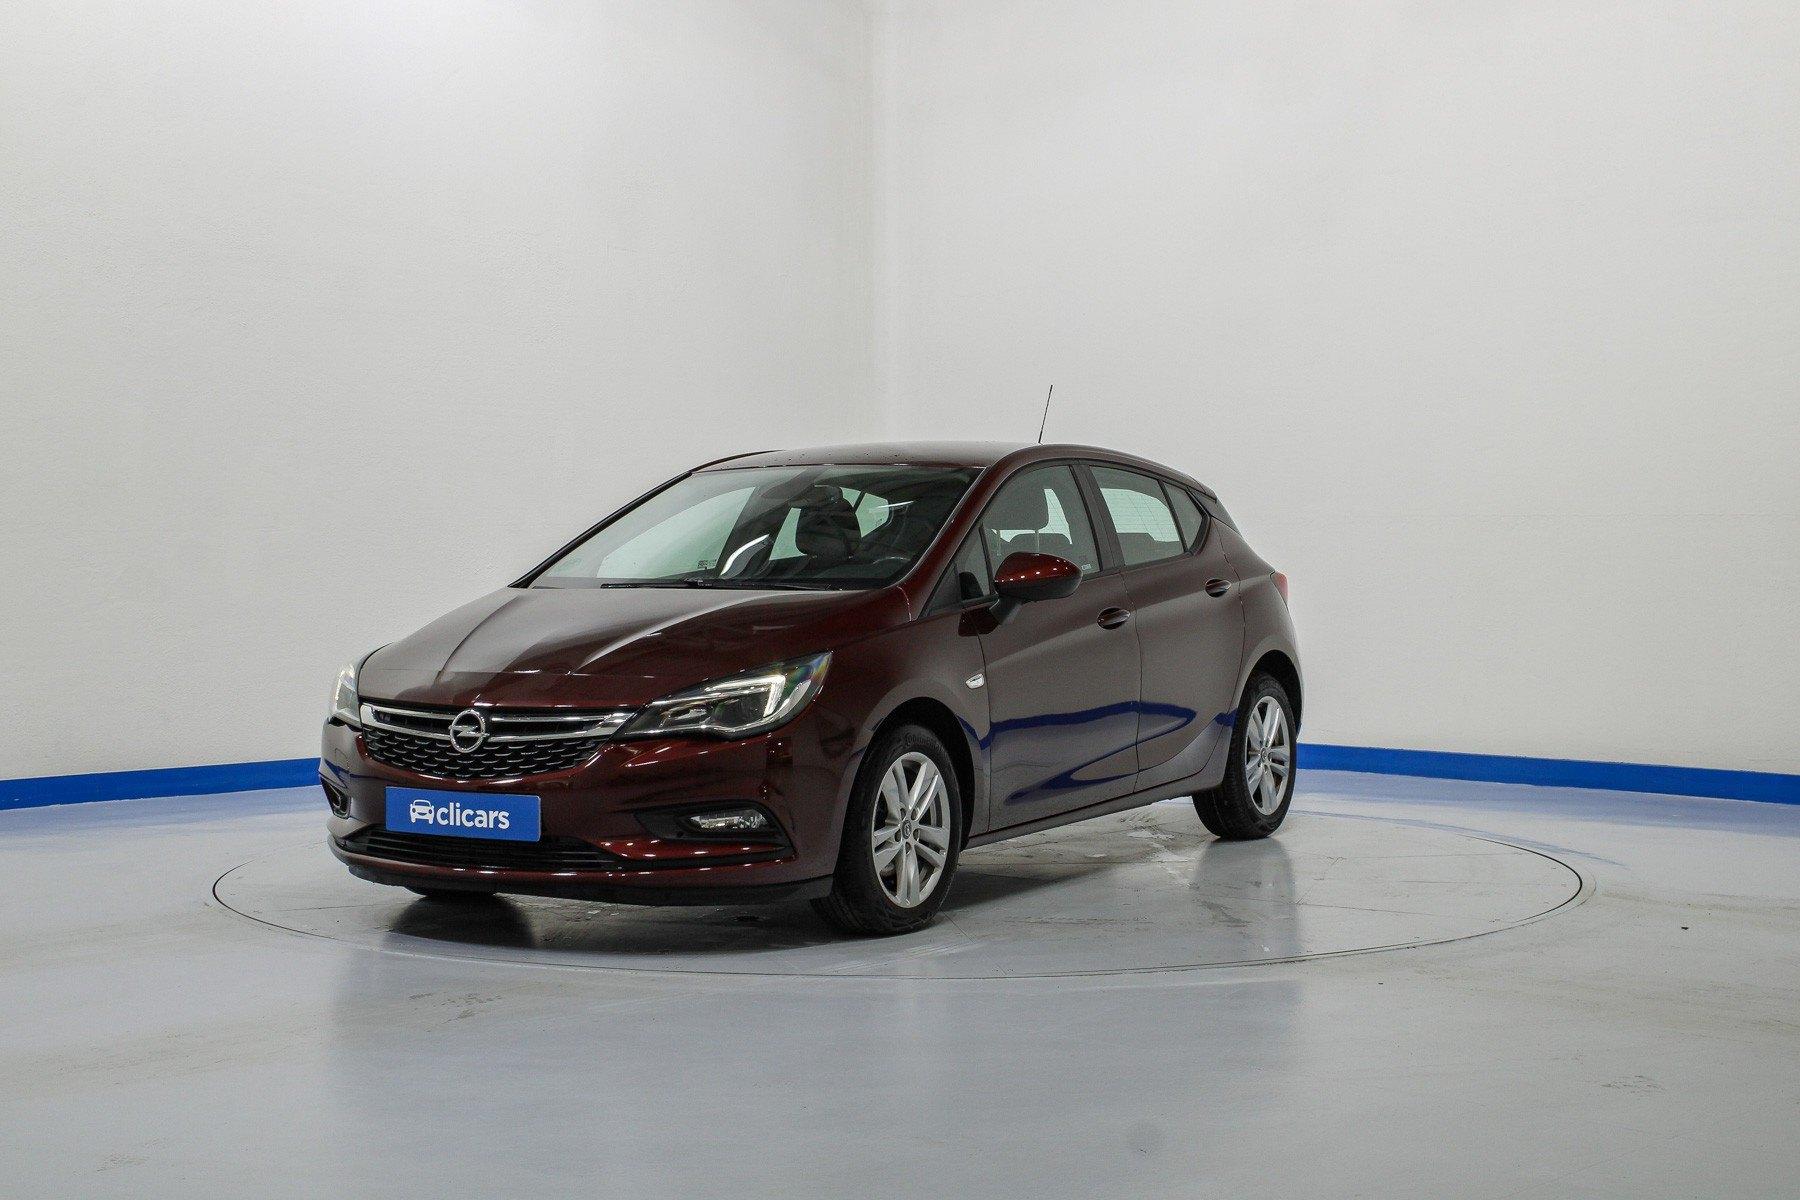 Opel Astra Gasolina 1.4 Turbo 92kW (125CV) Selective 1